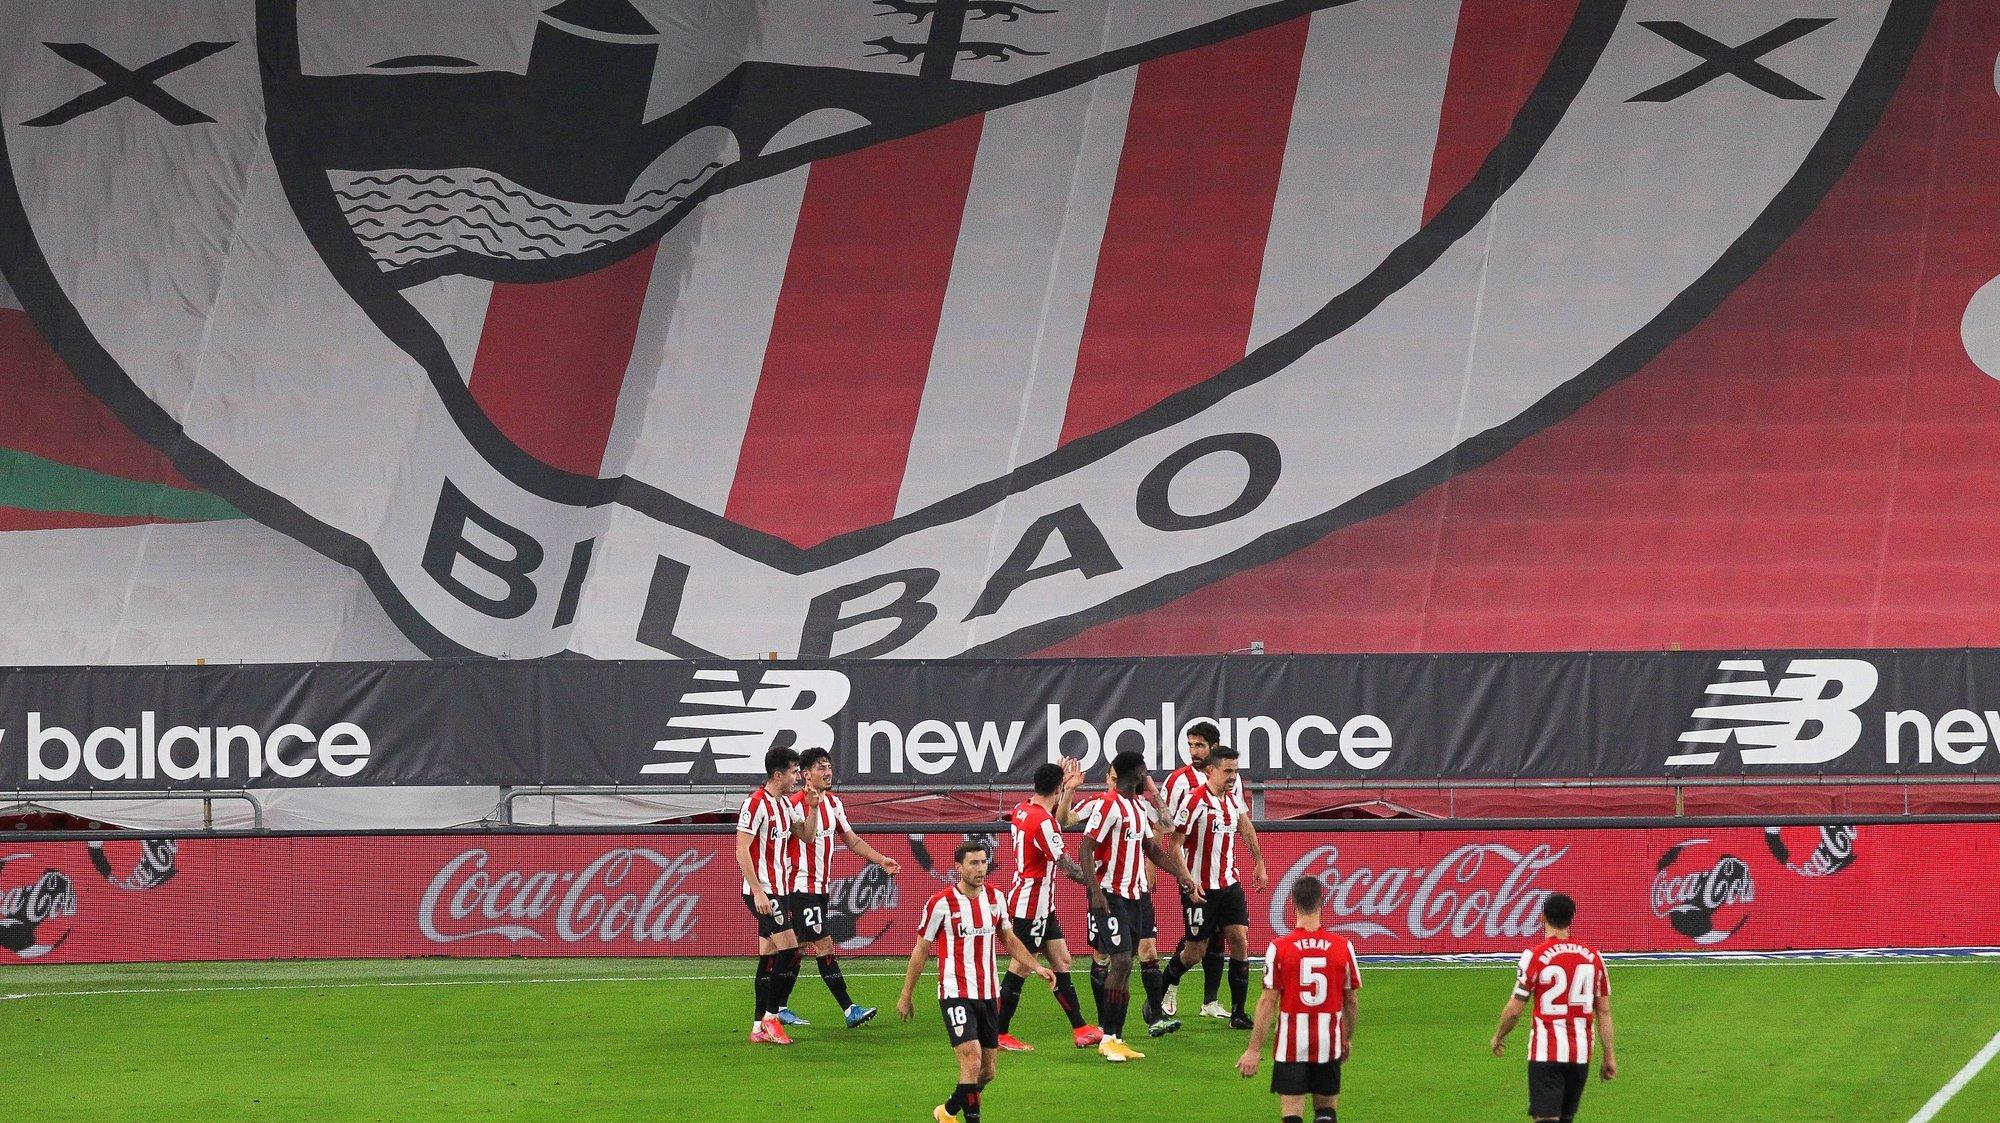 epa09060250 Bilbao players celebrate their 2-1 lead during the Spanish La Liga soccer match between Athletic Bilbao and Granada CF at San Mames stadium in Bilbao, Spain, 07 March 2021.  EPA/Miguel Tona